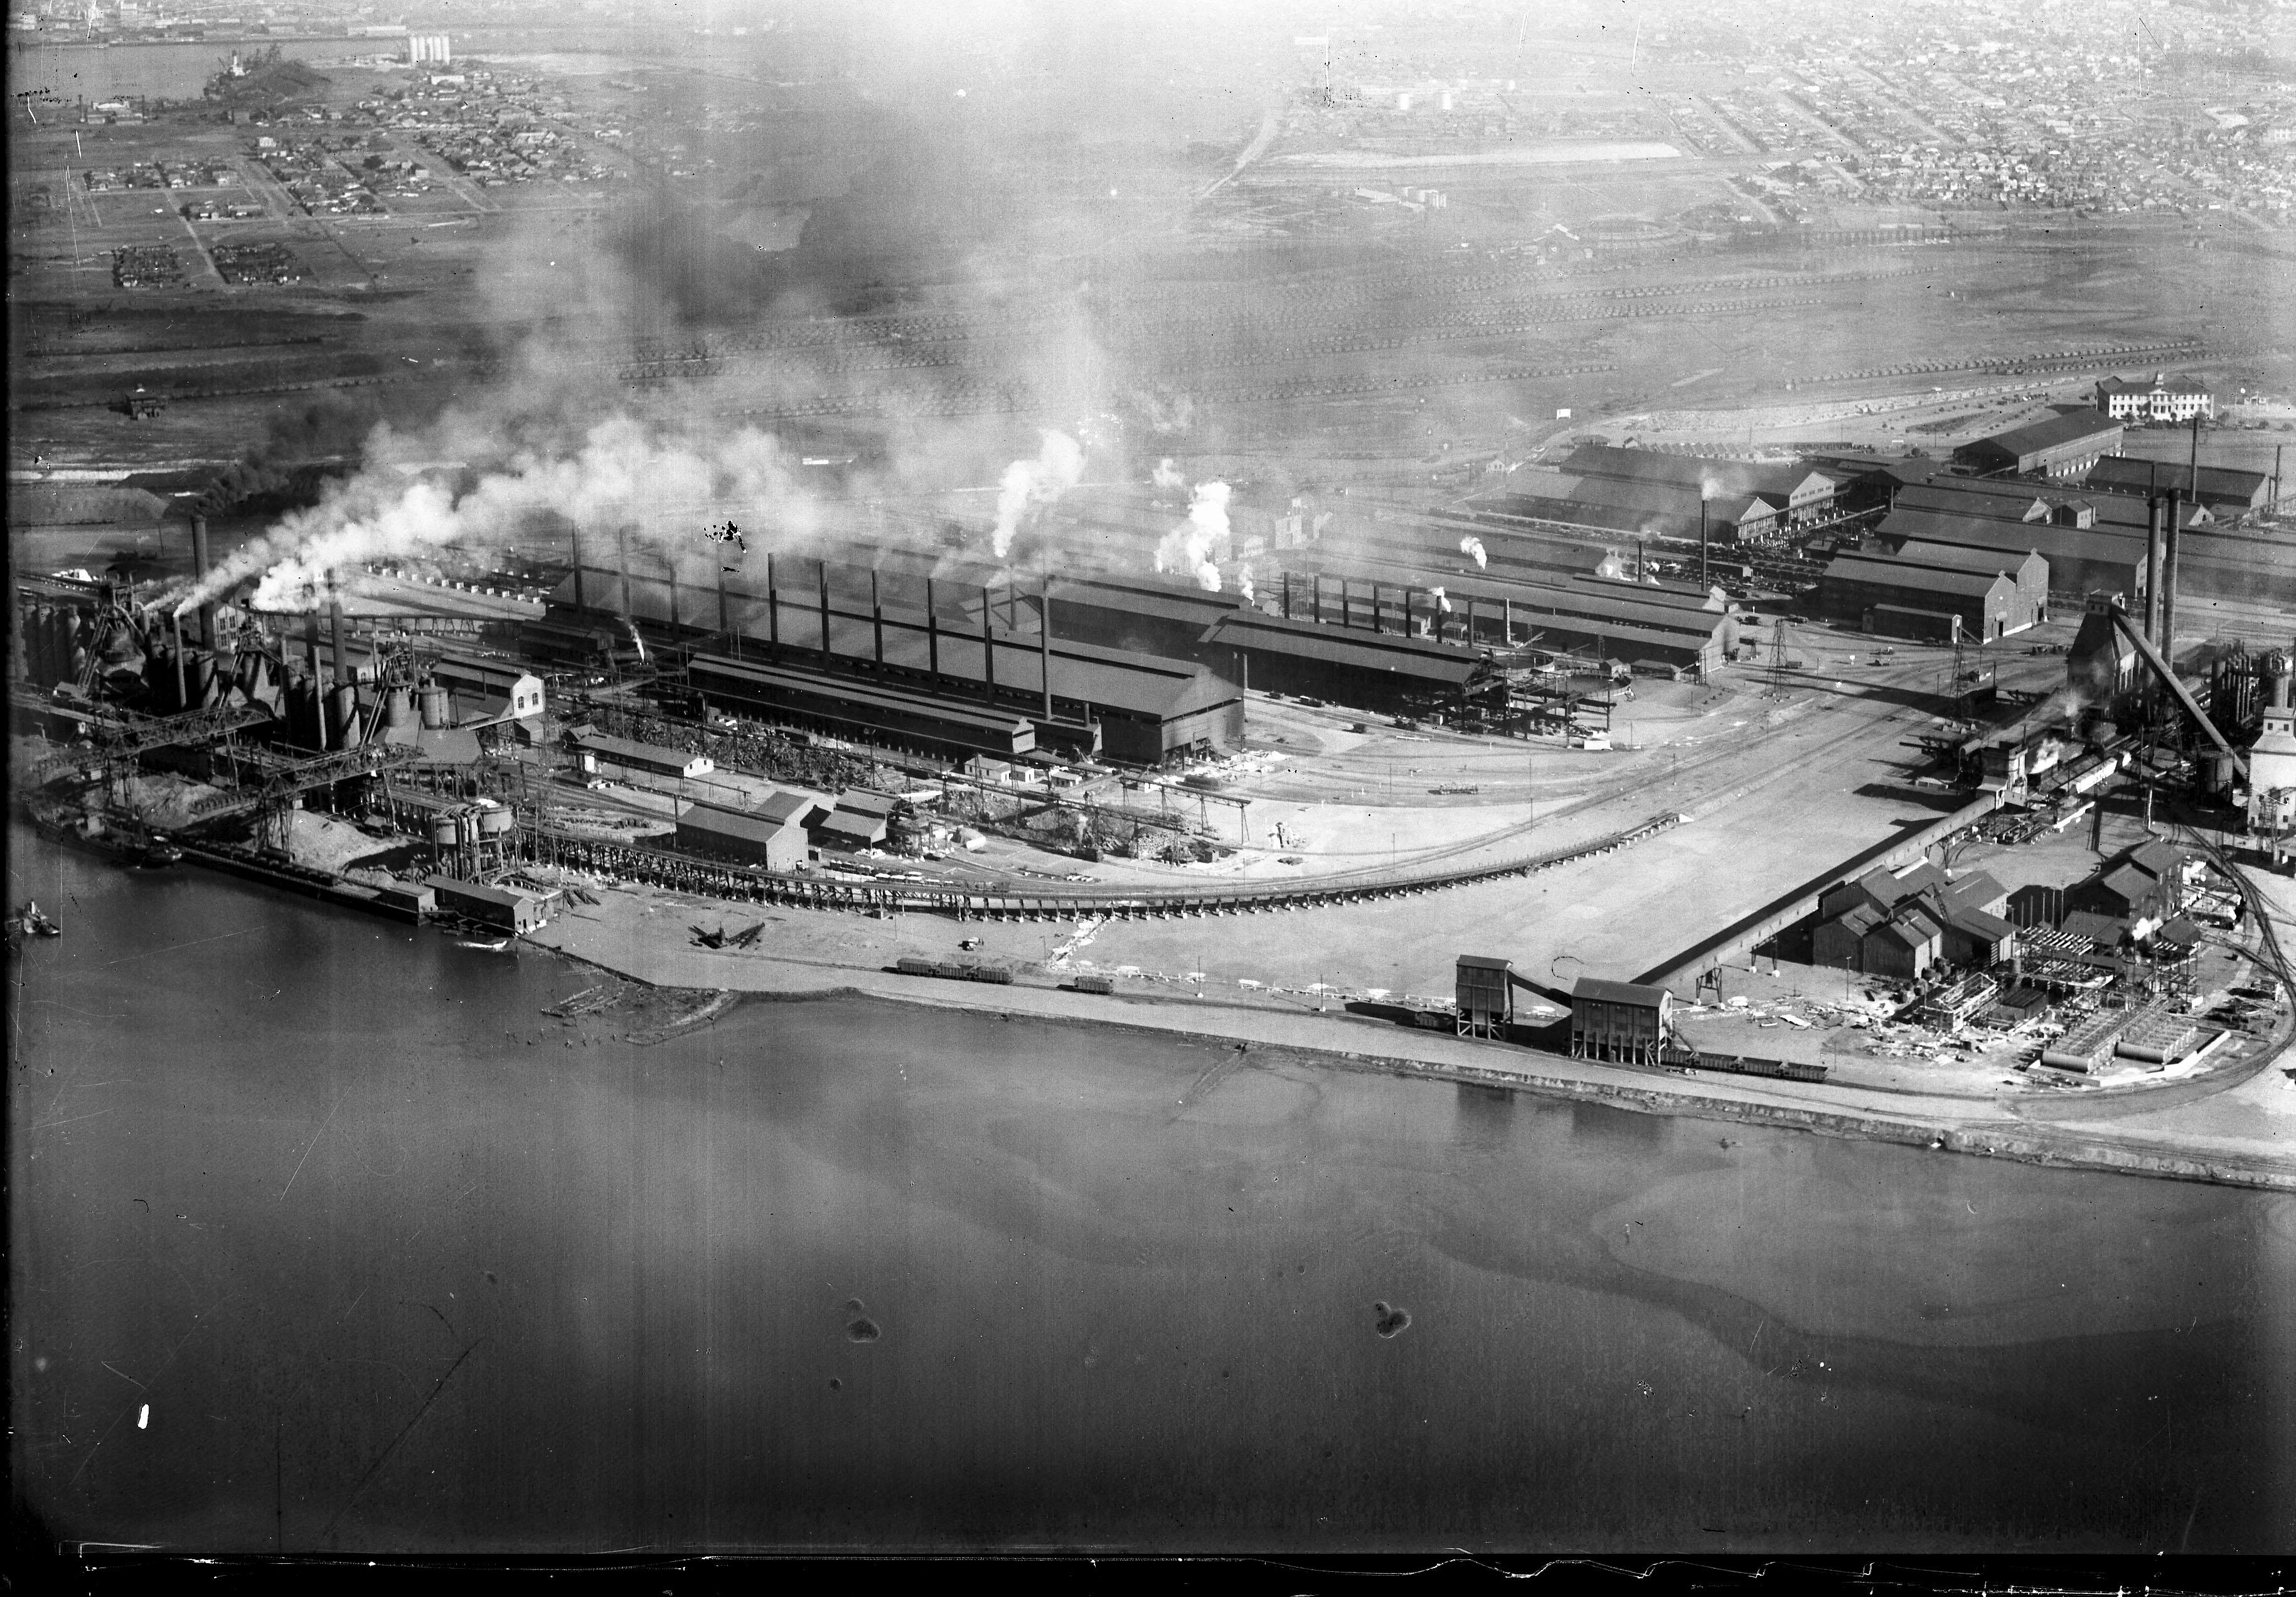 Newcastle aerial, 1935 (Image 62 Courtesy of Phillip Warren)